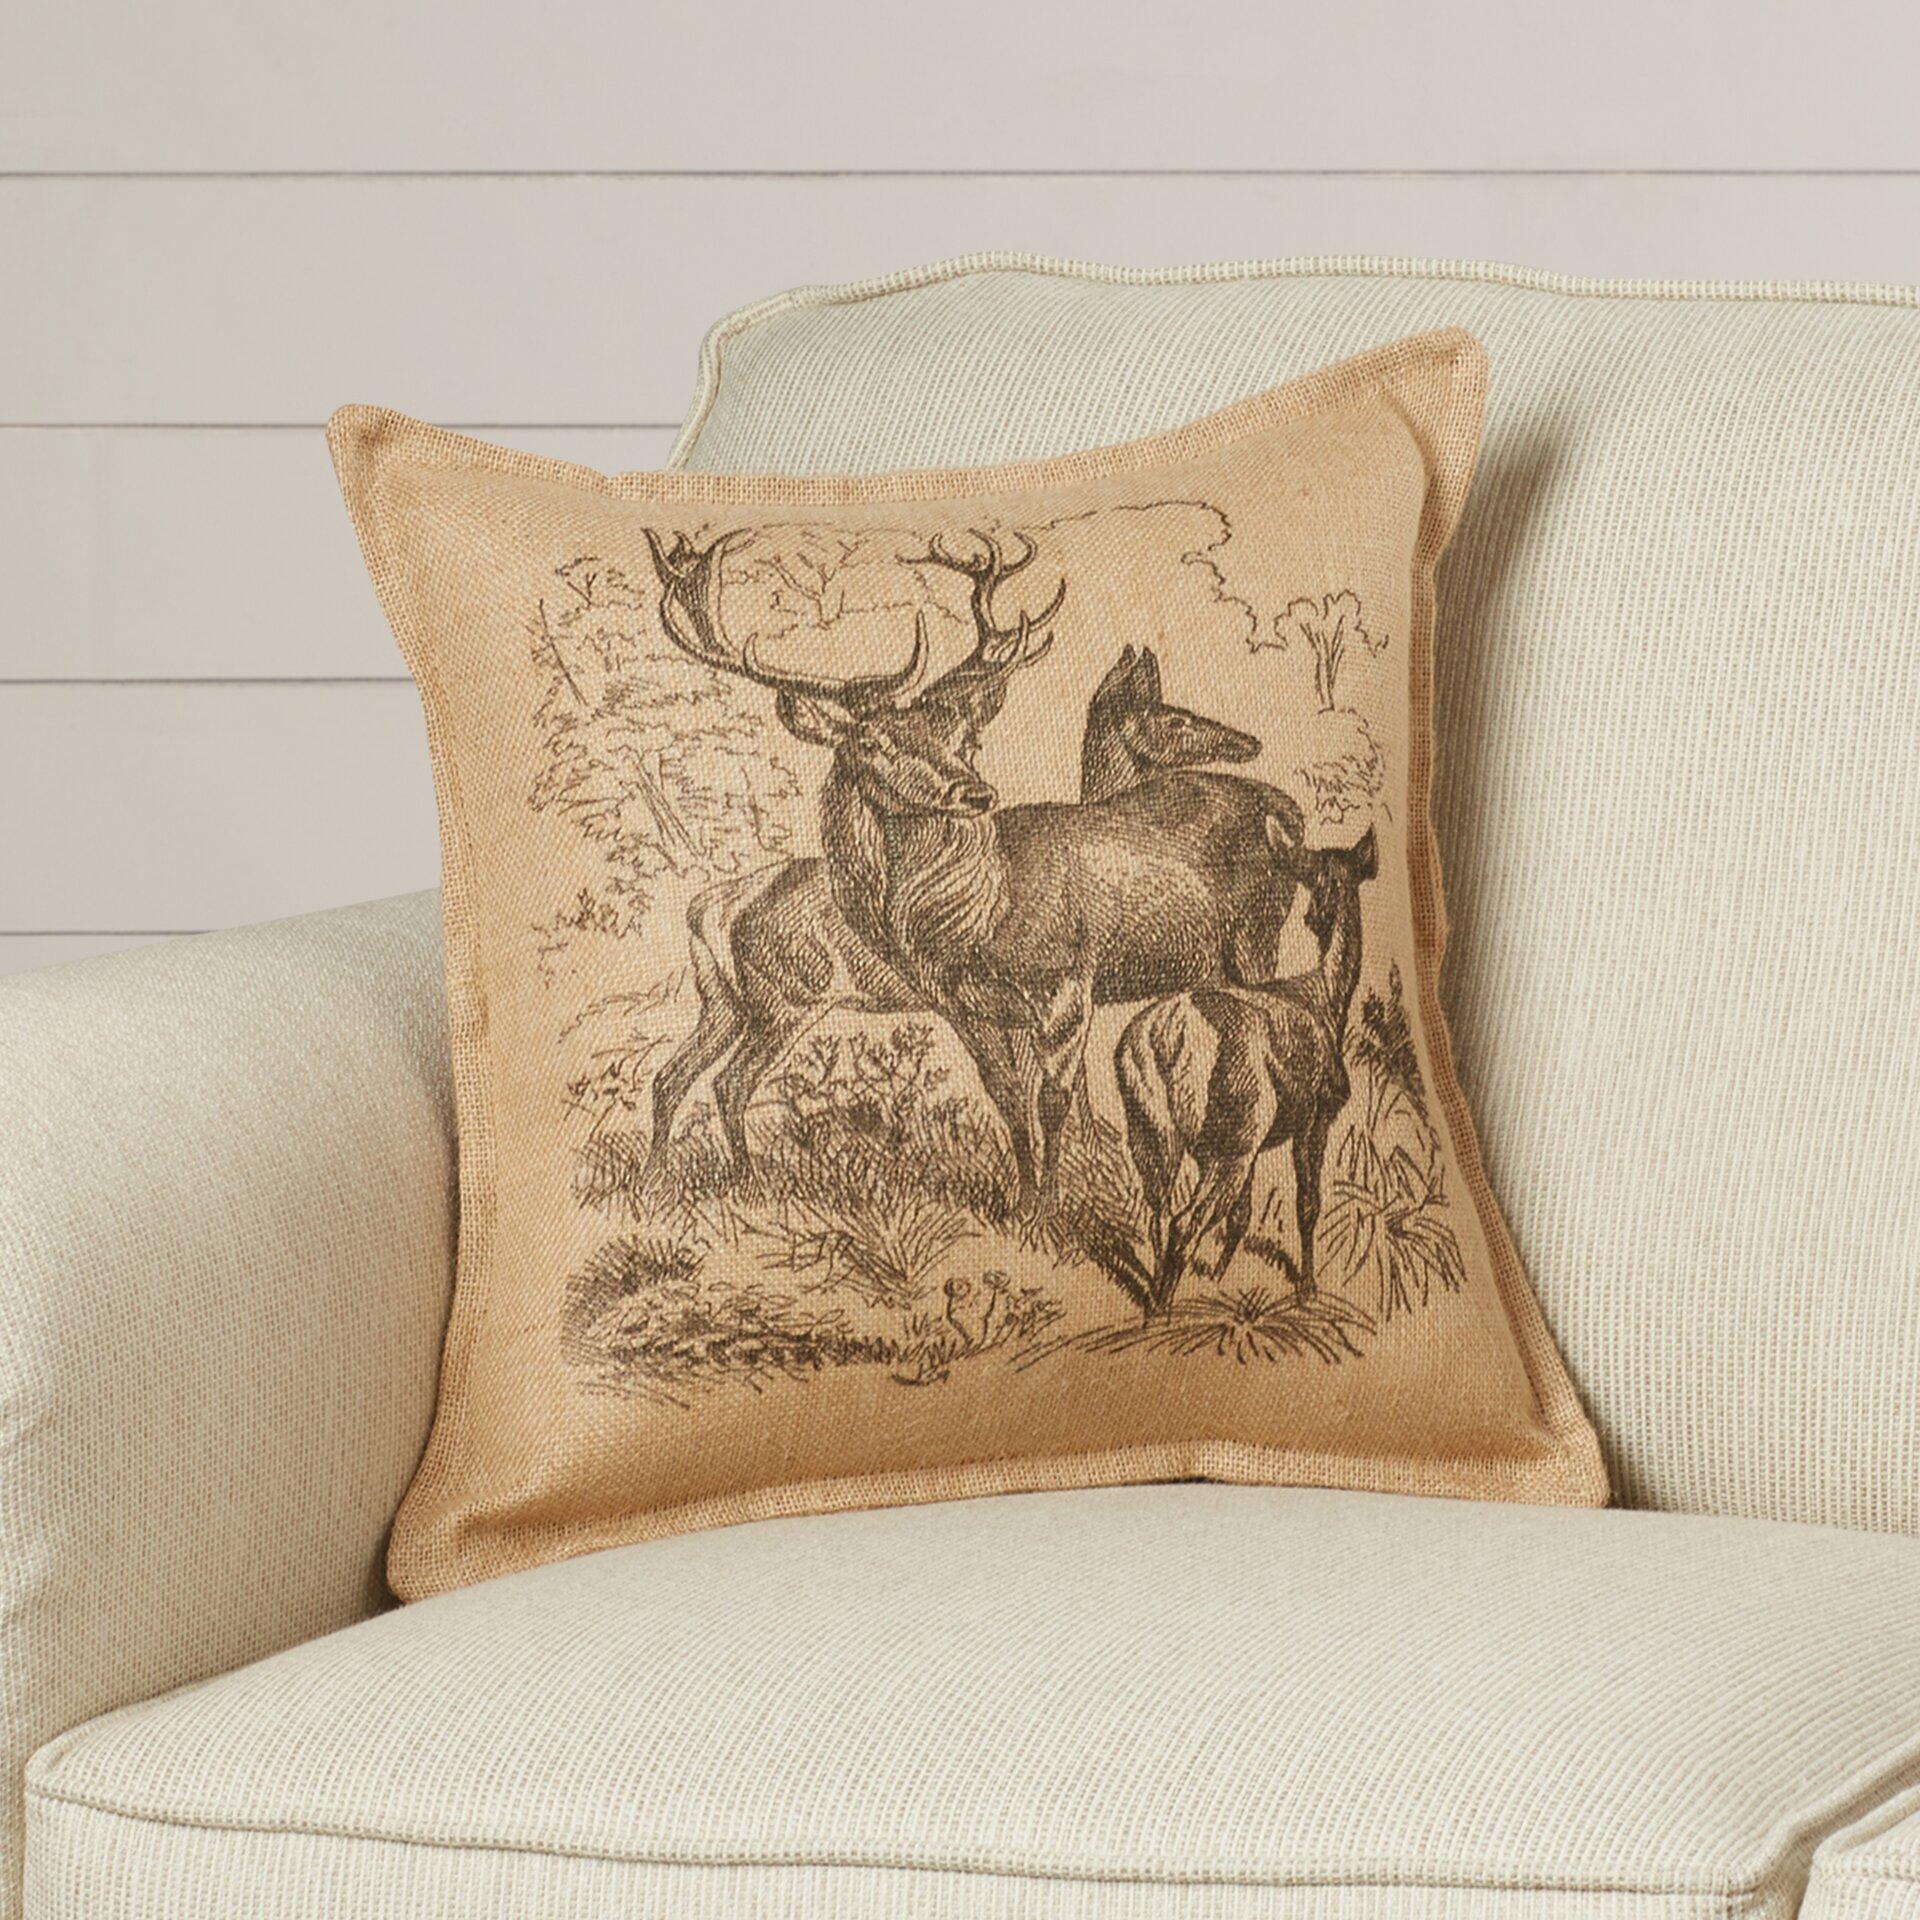 Throw Pillows With Deer : August Grove Eddie Deer Family Burlap Throw Pillow & Reviews Wayfair